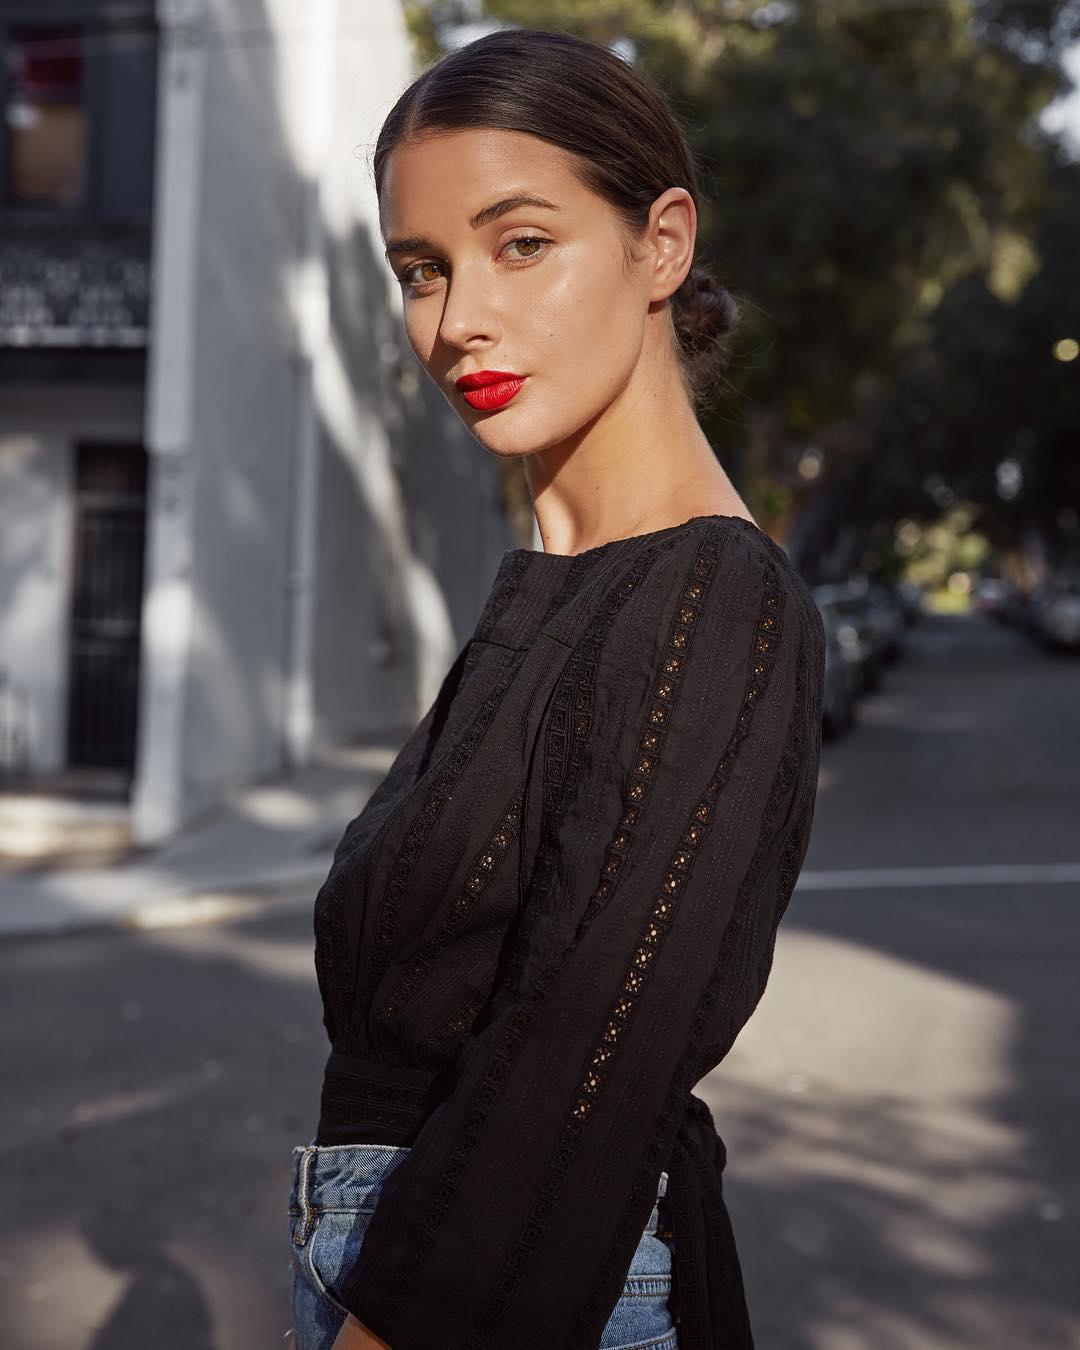 sara crampton mặc áo blouse đen